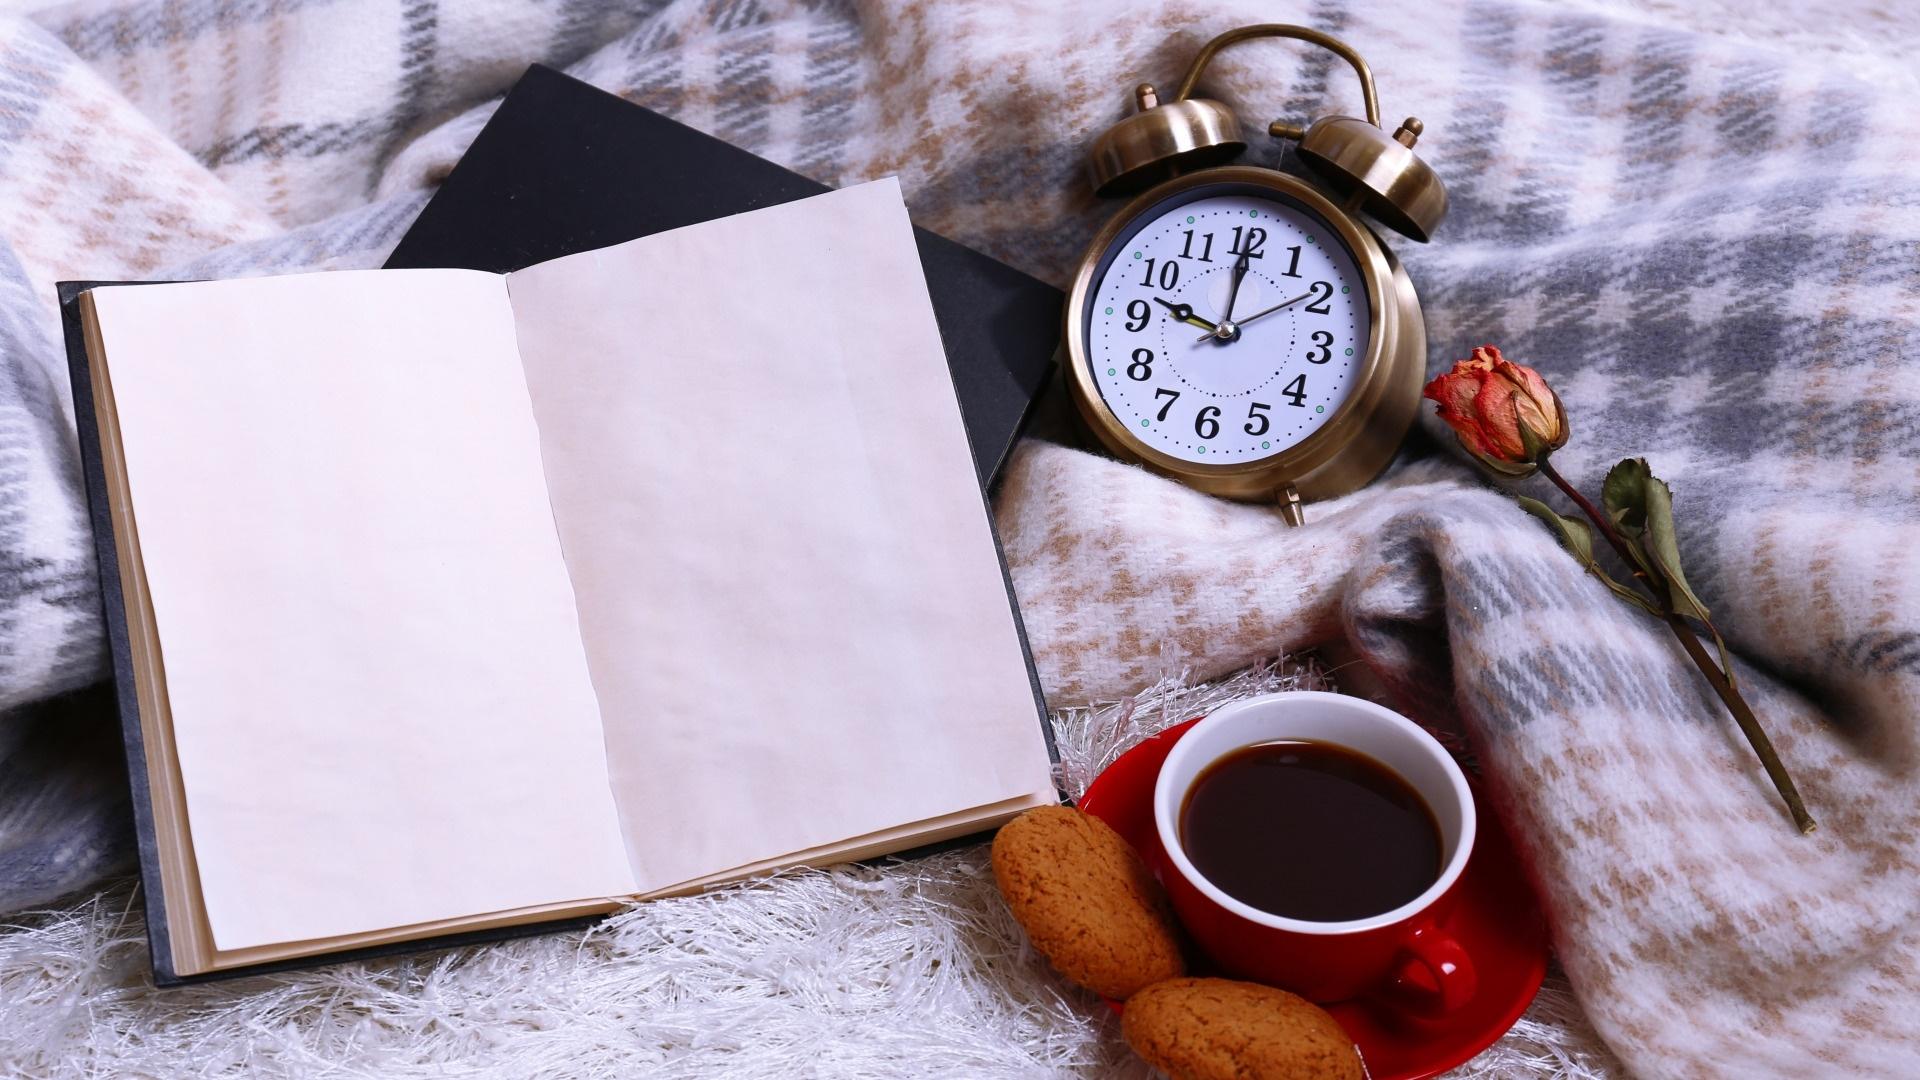 Book And Coffee Desktop Wallpaper